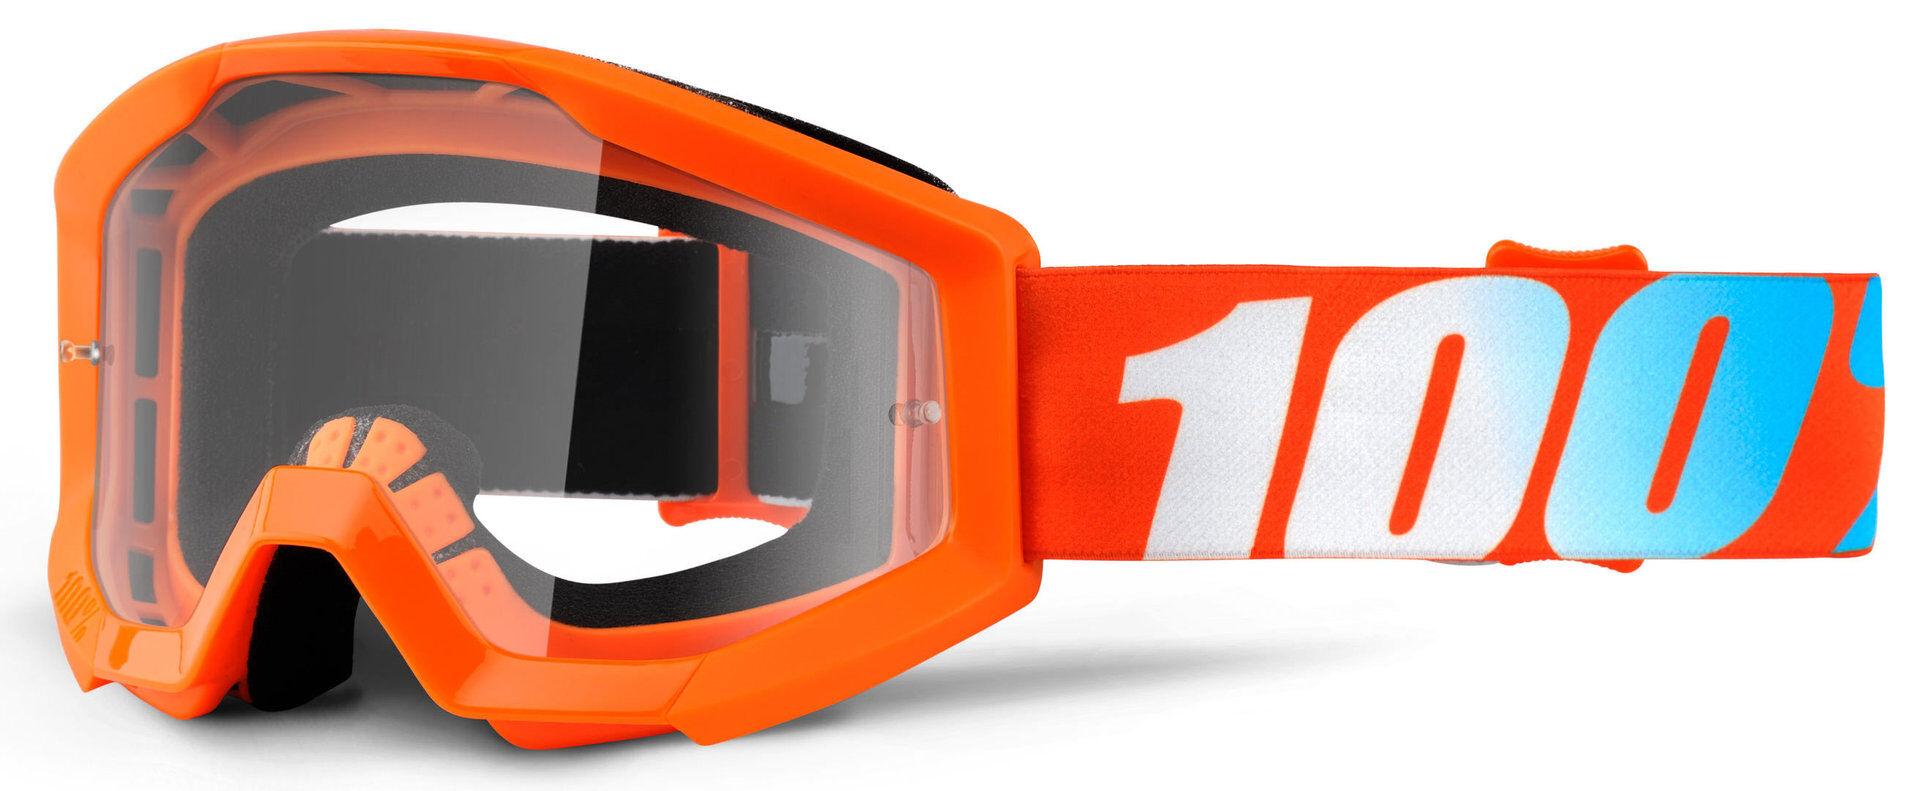 100% Strata JR Kids Motocross Goggles Blue Orange One Size